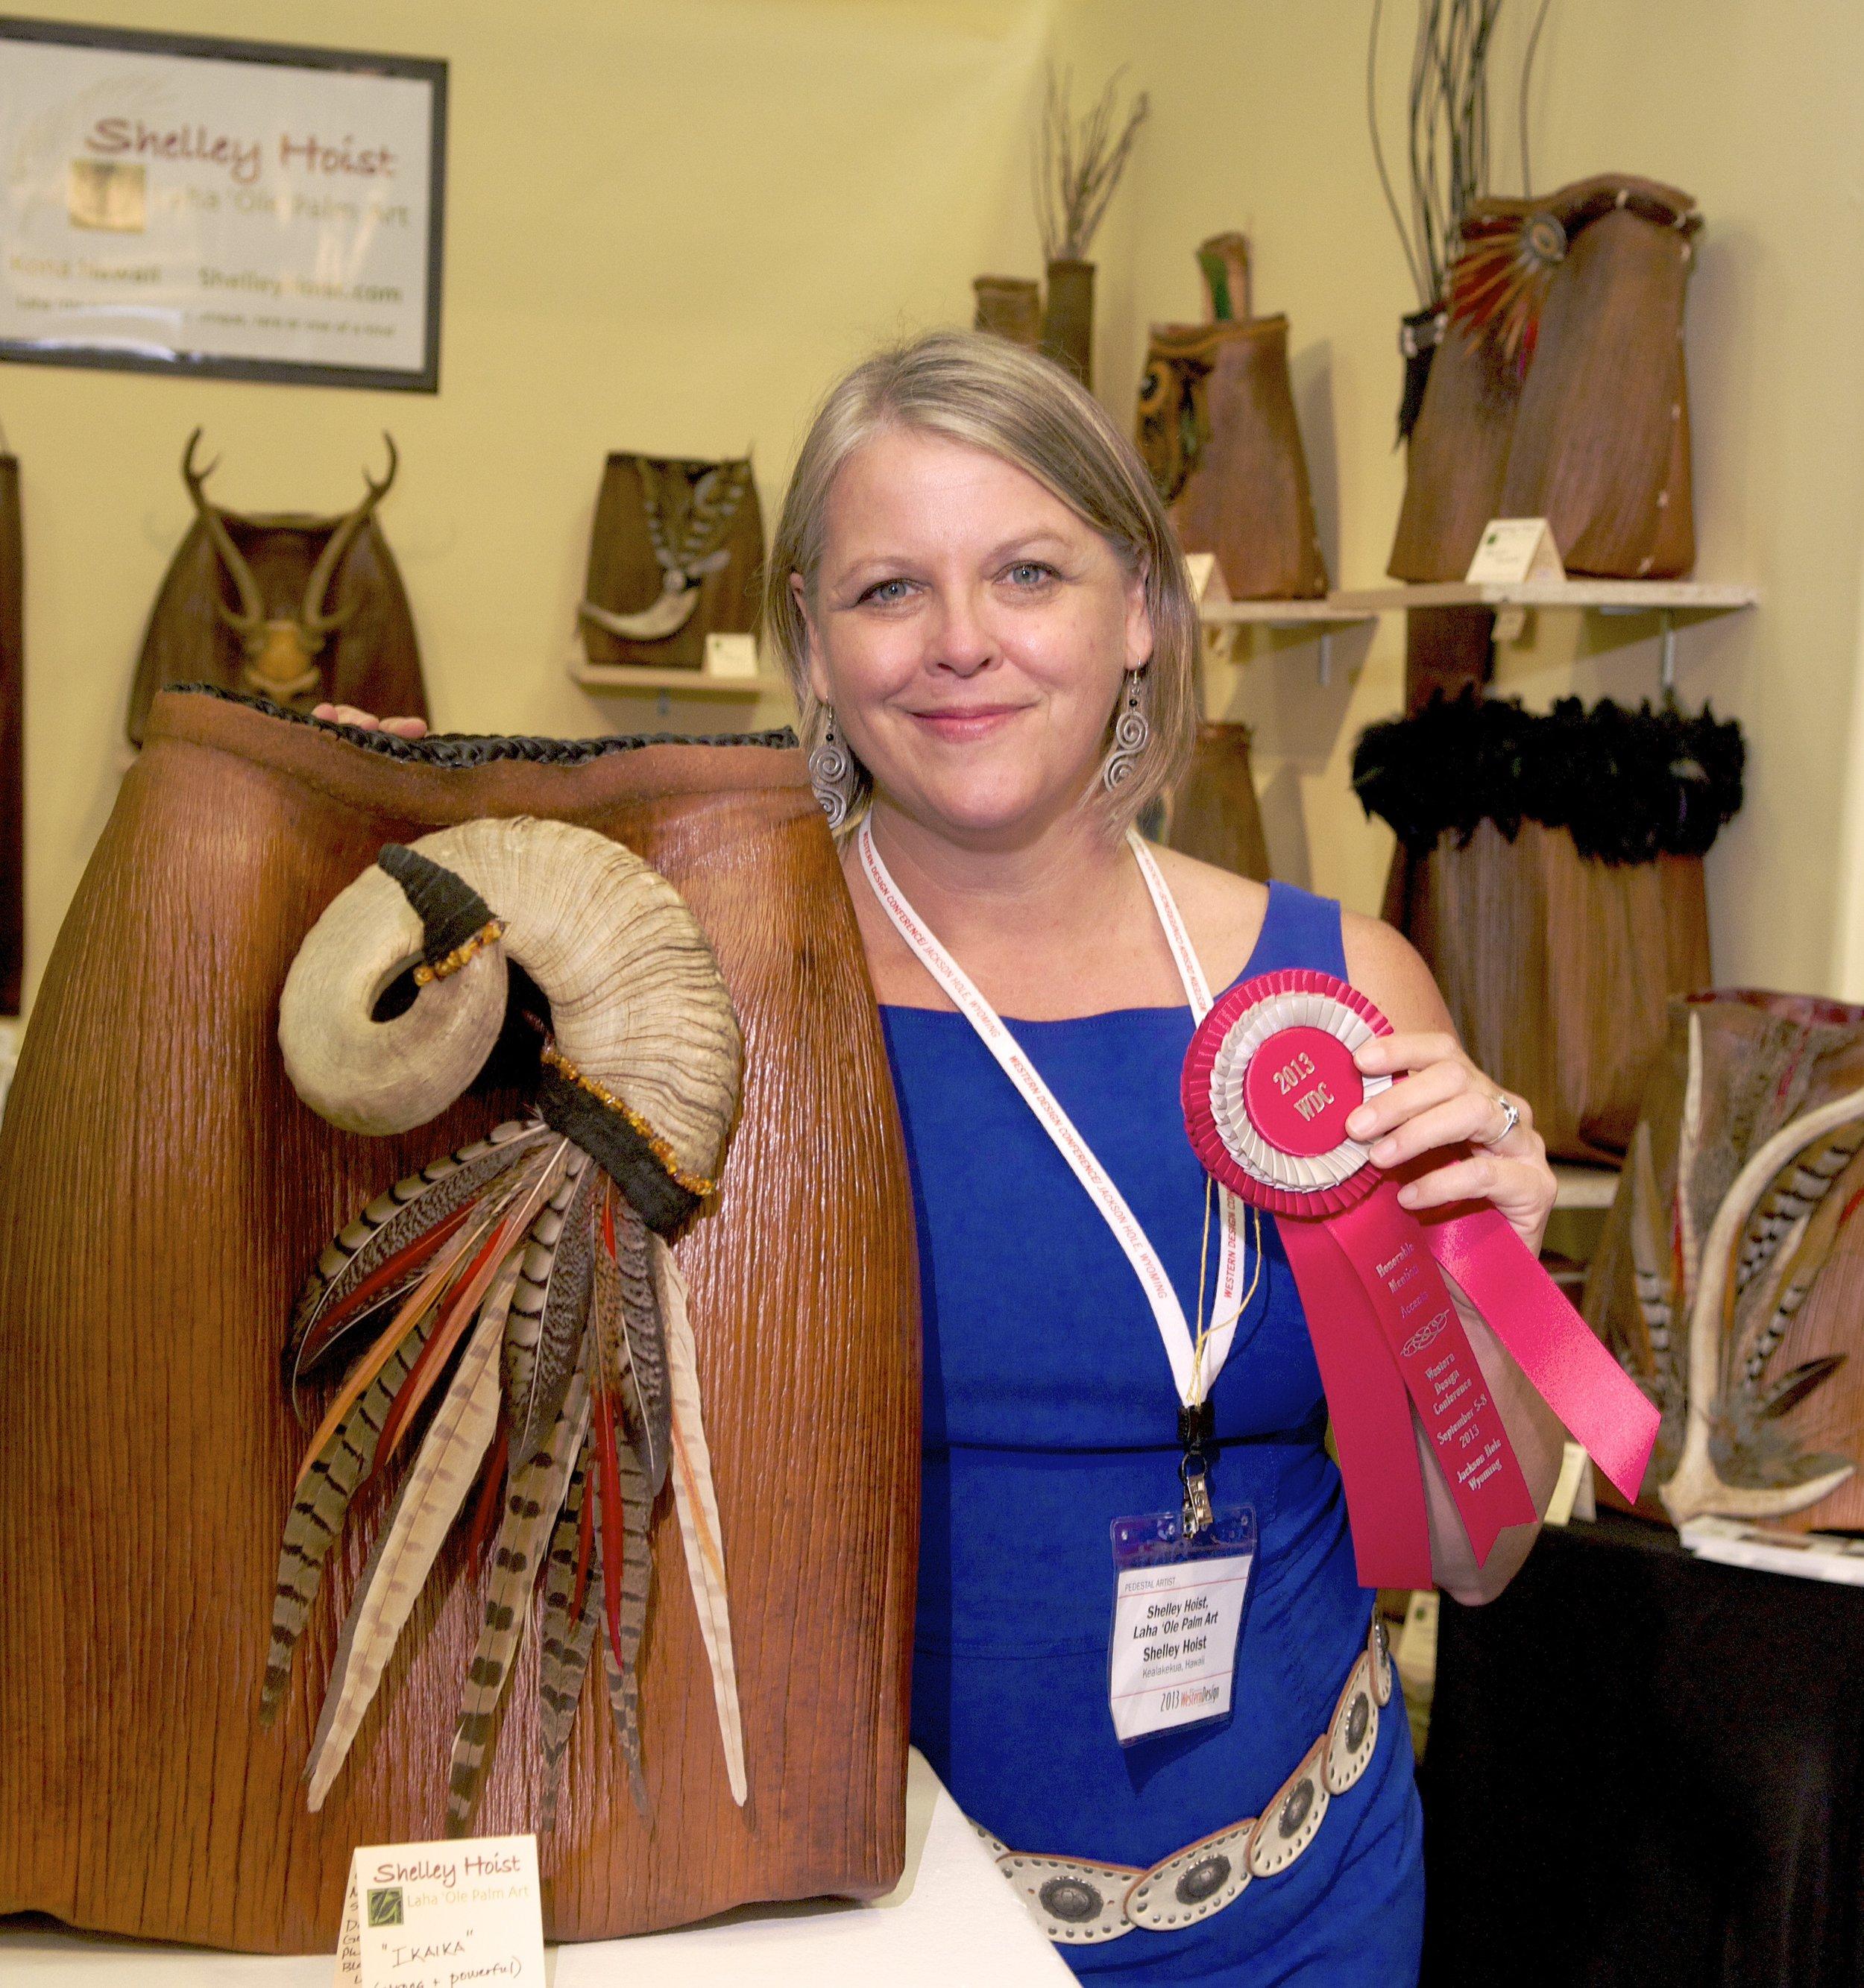 Shelley Hoist and Award Winning Ikaika 2013.JPG